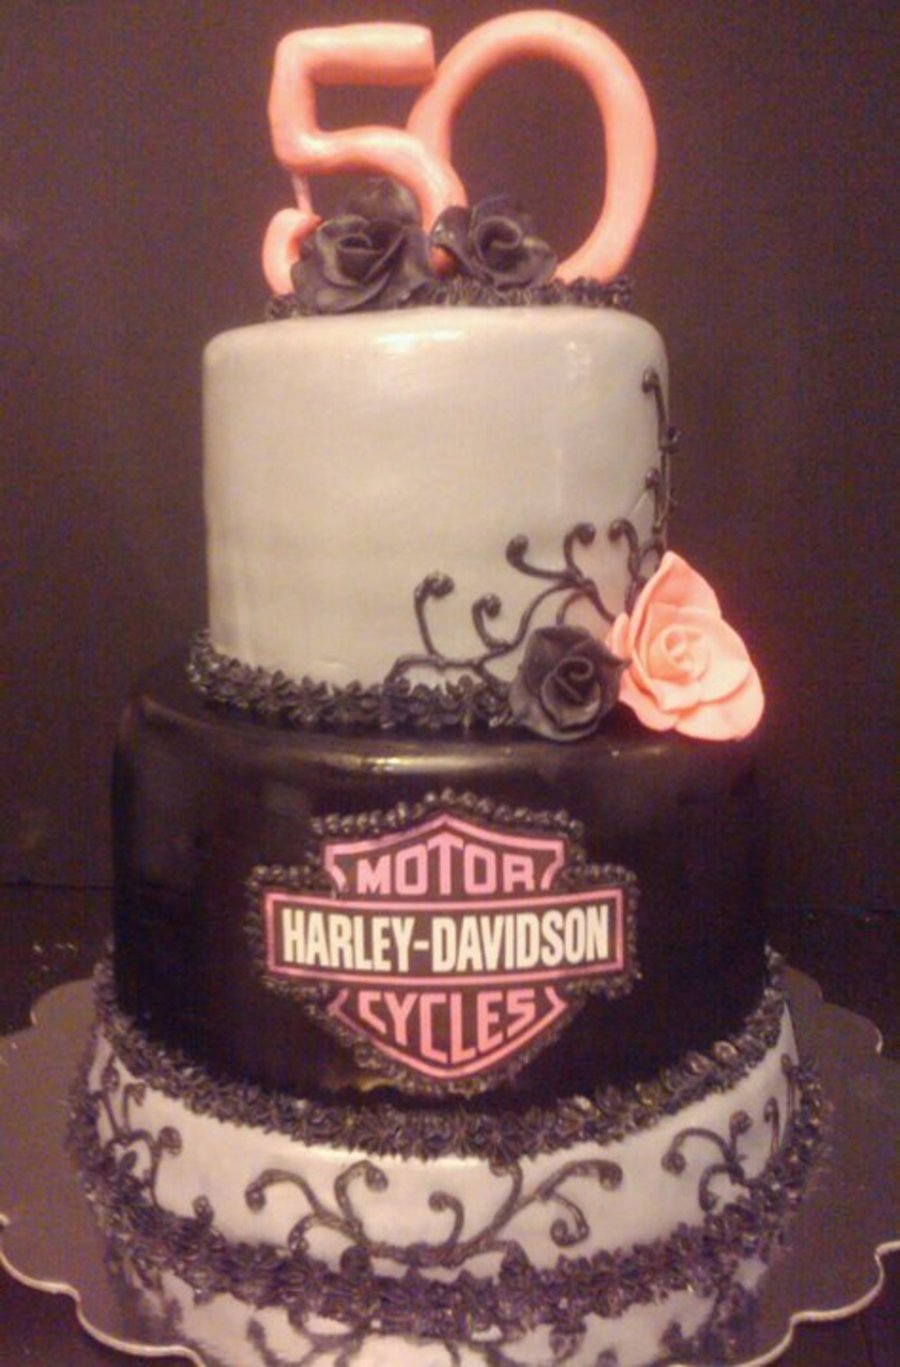 Harley Davidson Womens 50th Birthday Cake Cakecentral Com